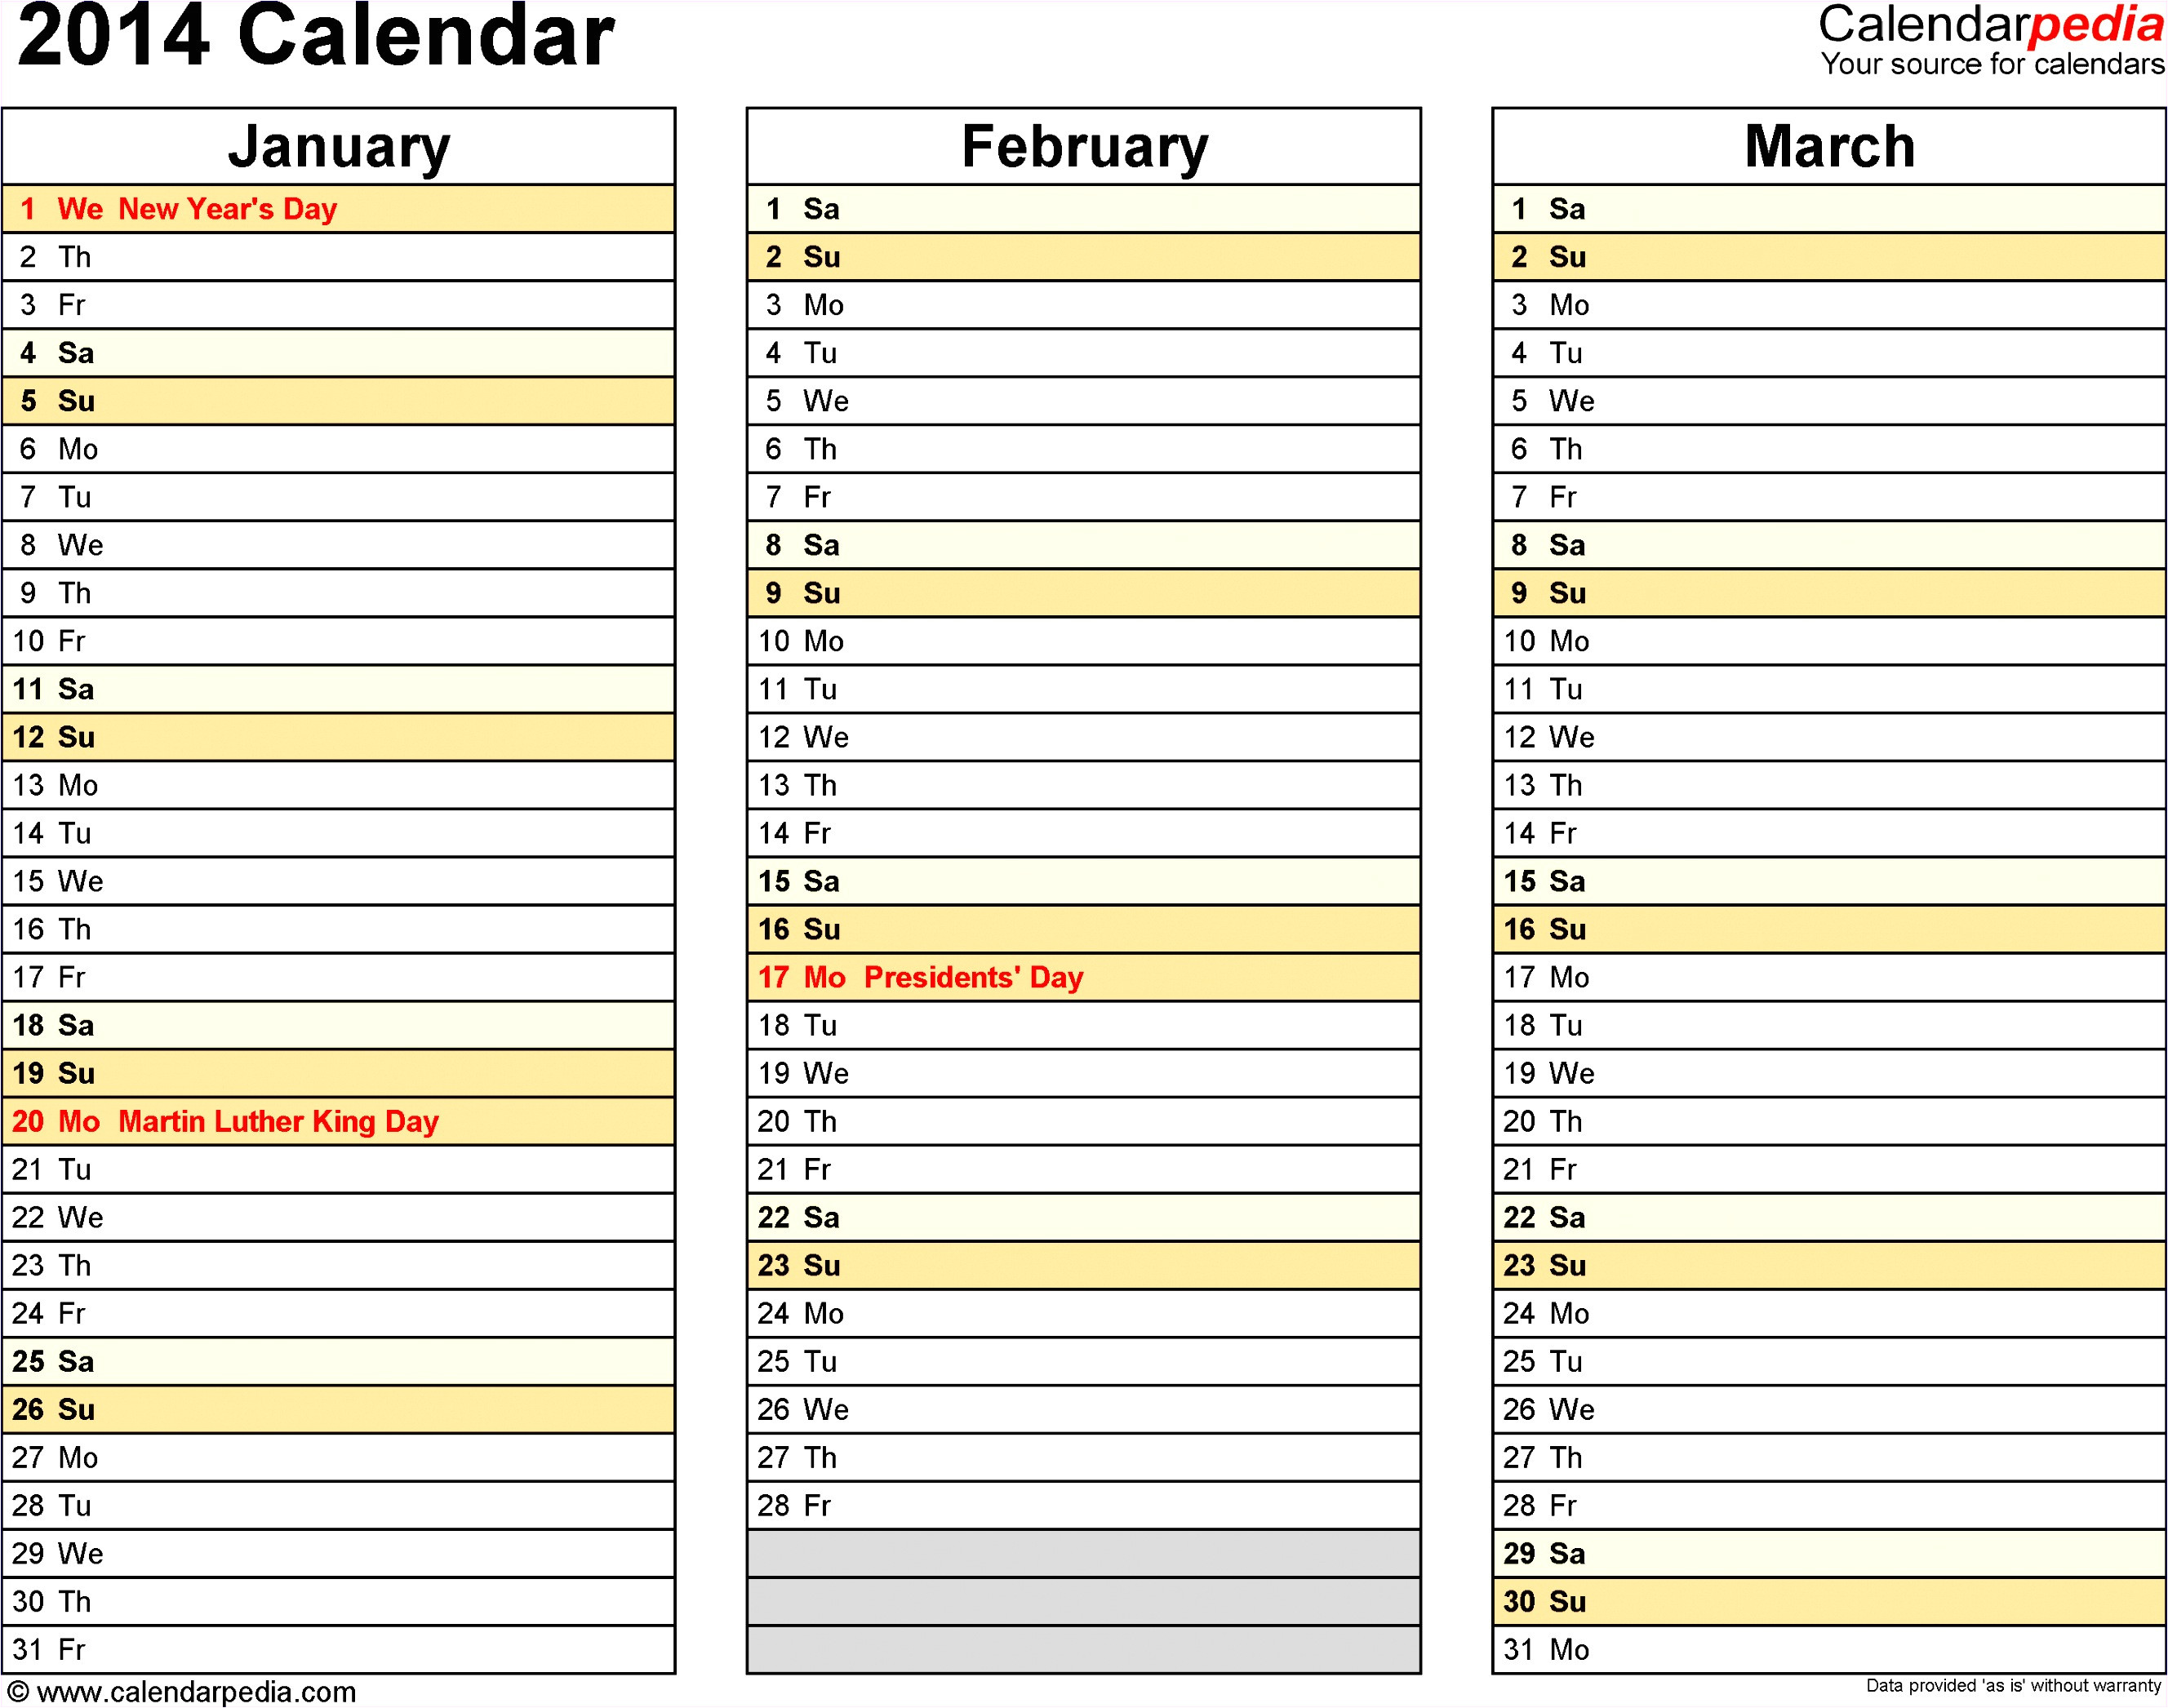 Microsoft Excel Calendar Templates 2014 9 Ms Excel Calendar Template 2014 Exceltemplates